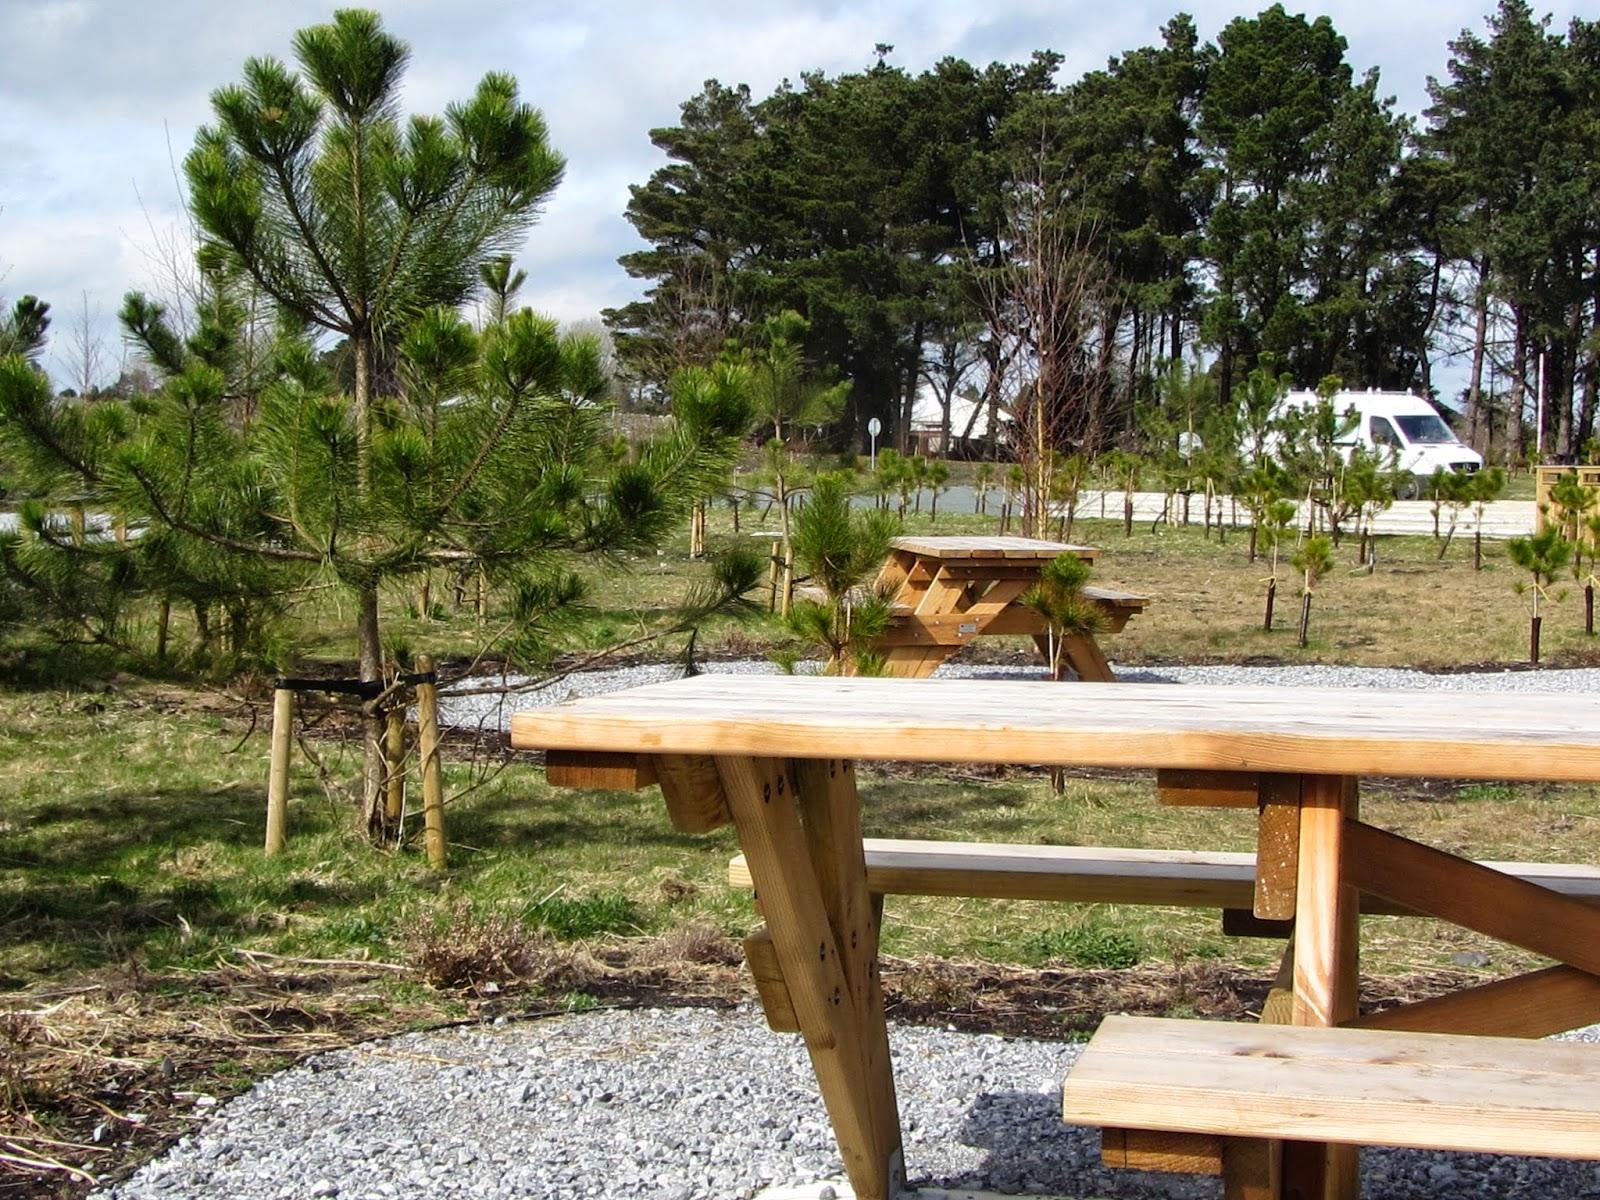 Picnic Table Lough Boora